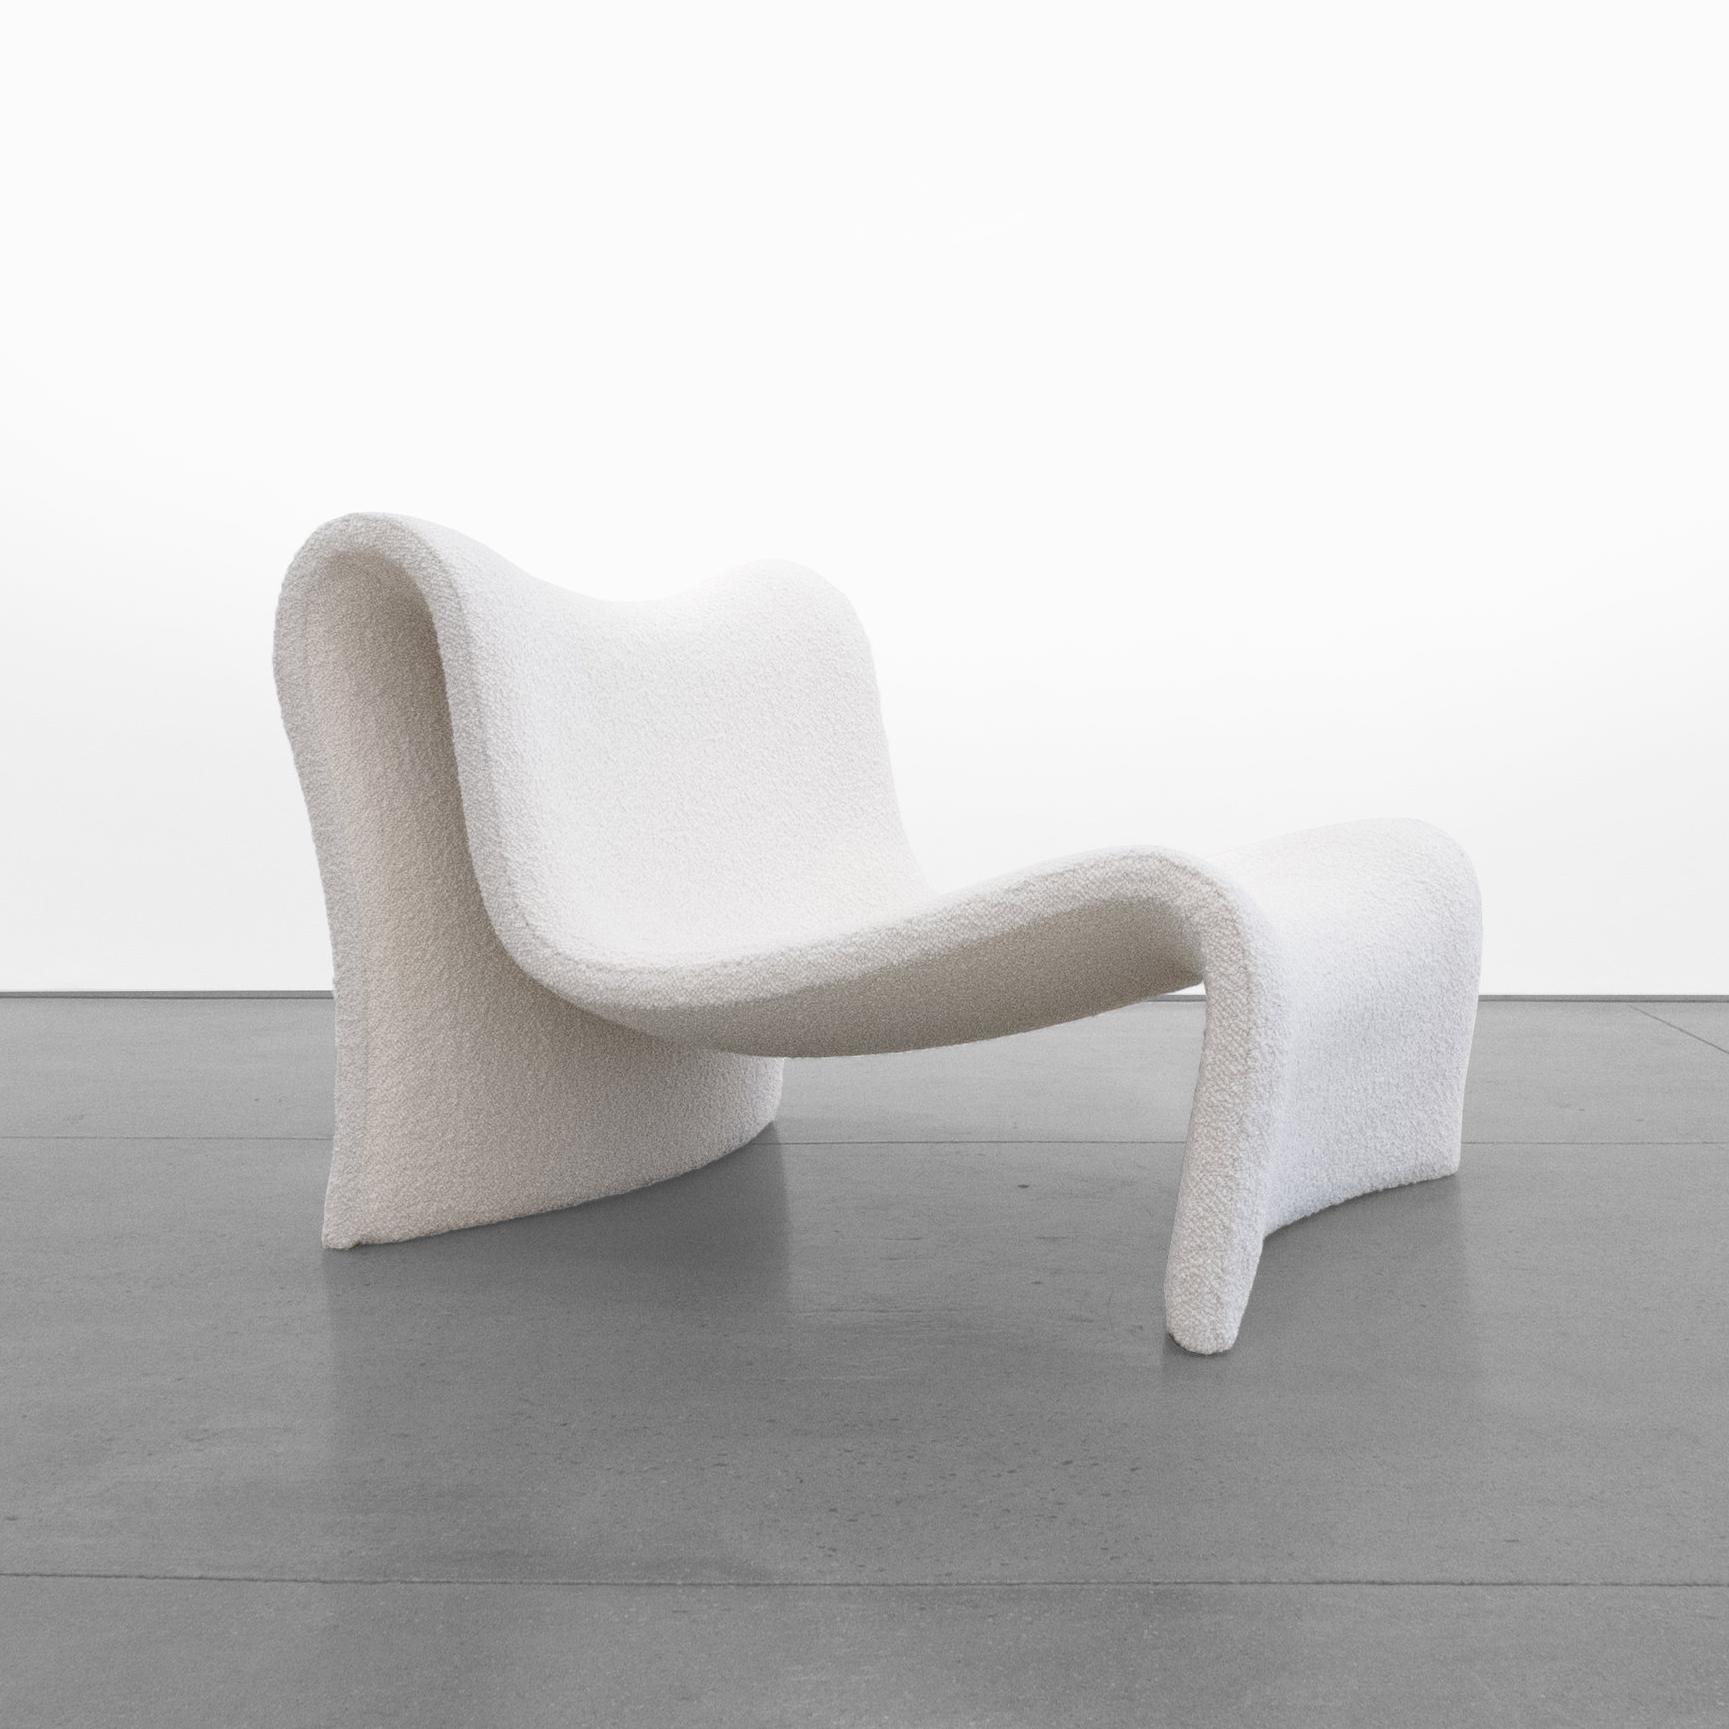 mid-century wave chair 20th century …